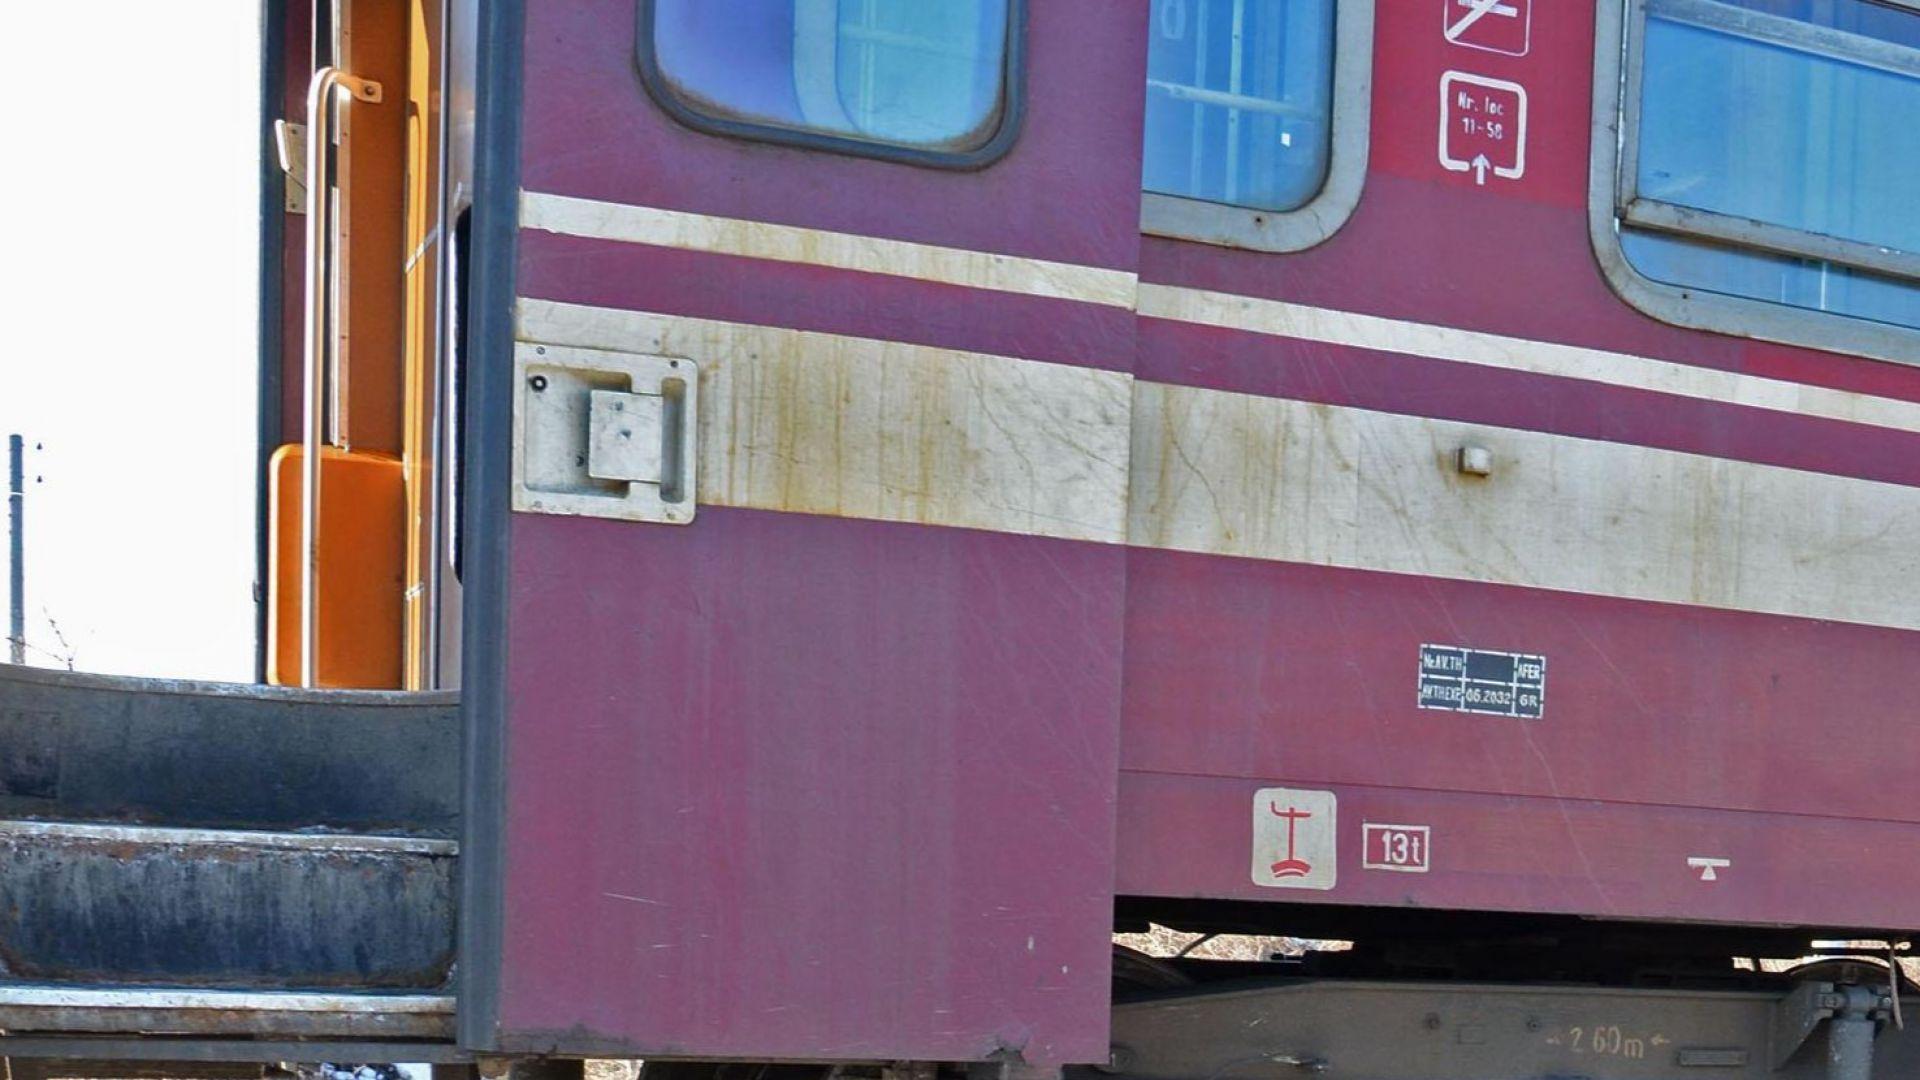 Полицията спря влак в района на Вакарел заради намушкан човек